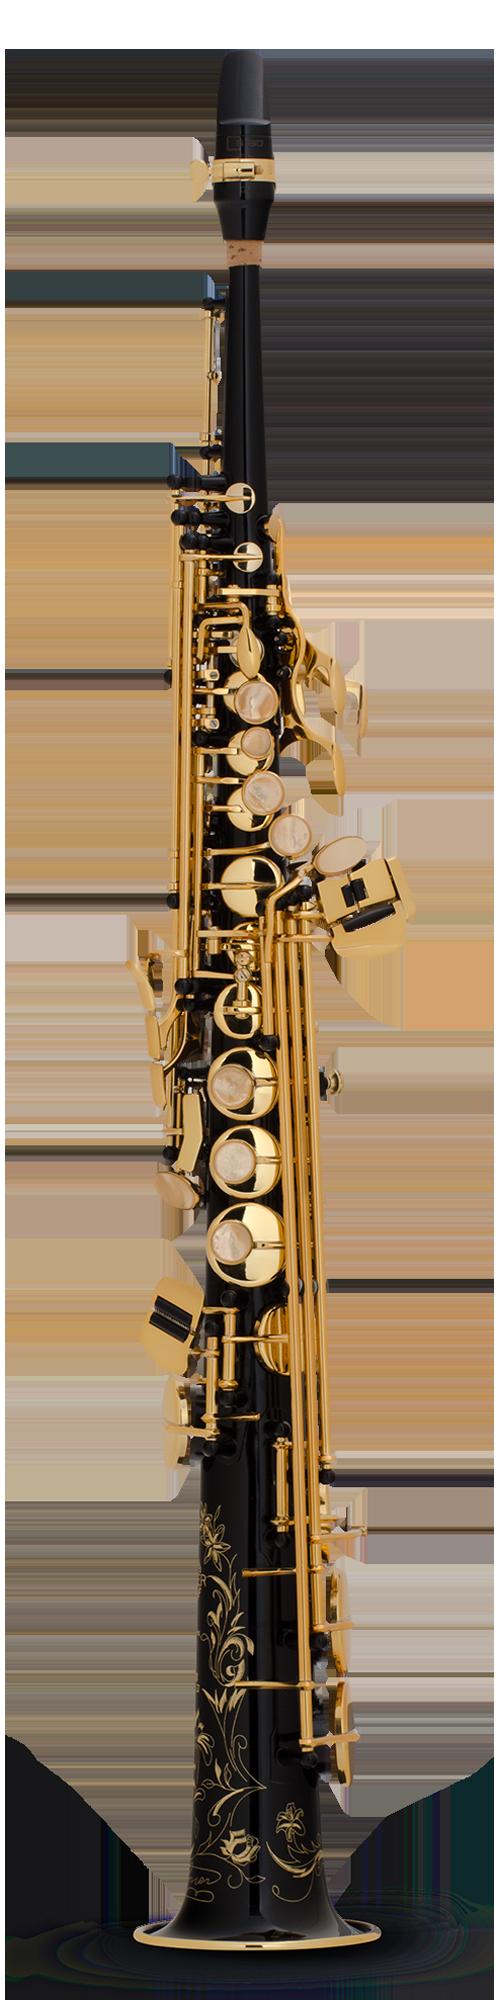 Clarinet clipart soprano saxophone.  jbl conn selmer